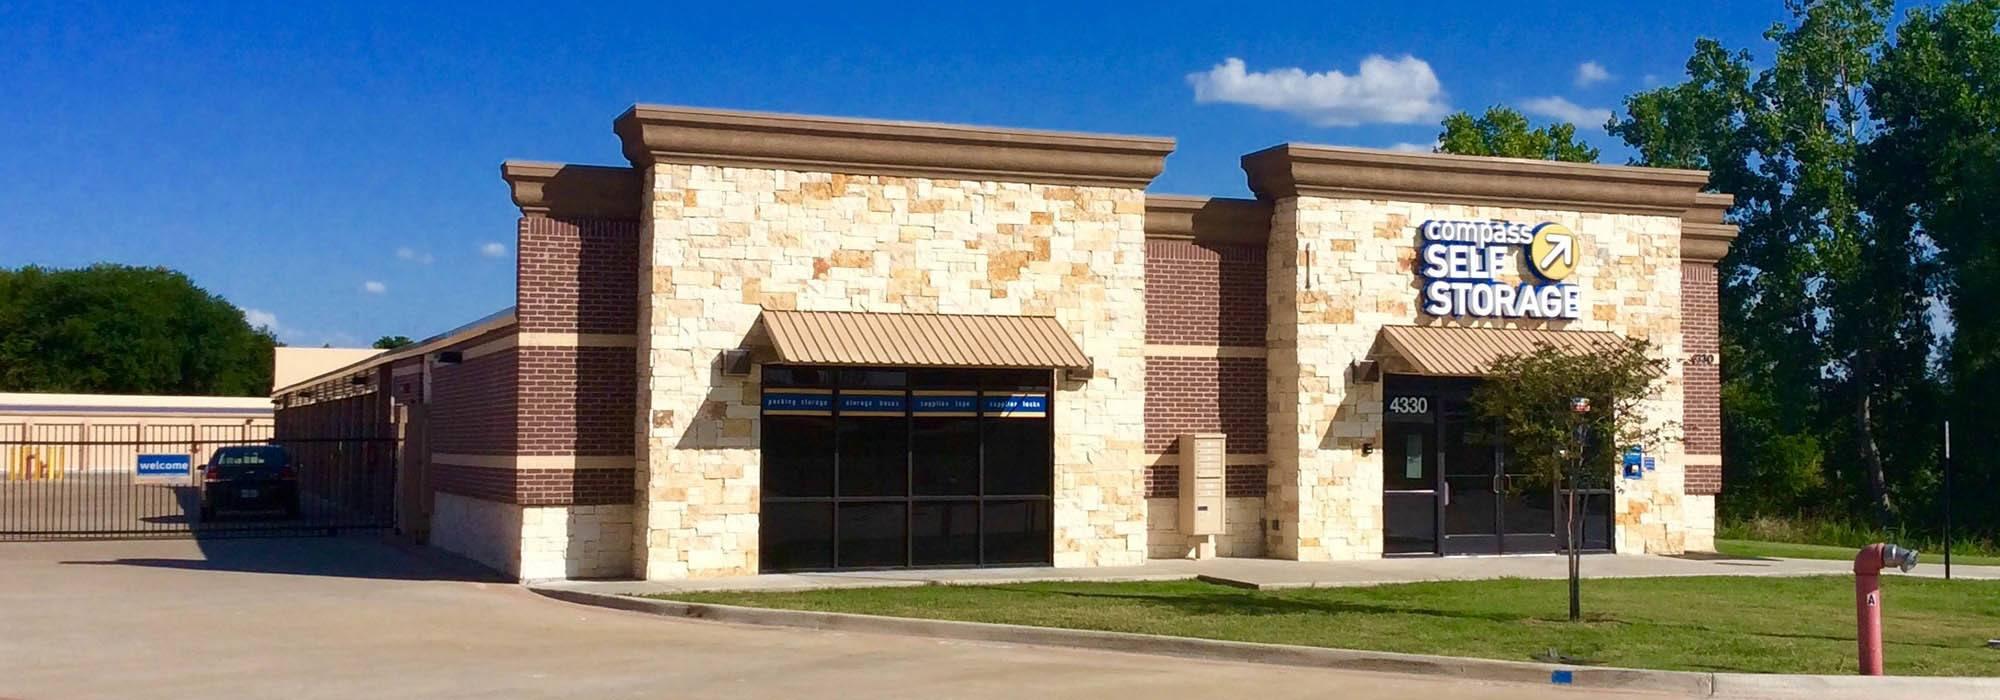 Self storage in Grand Prairie TX